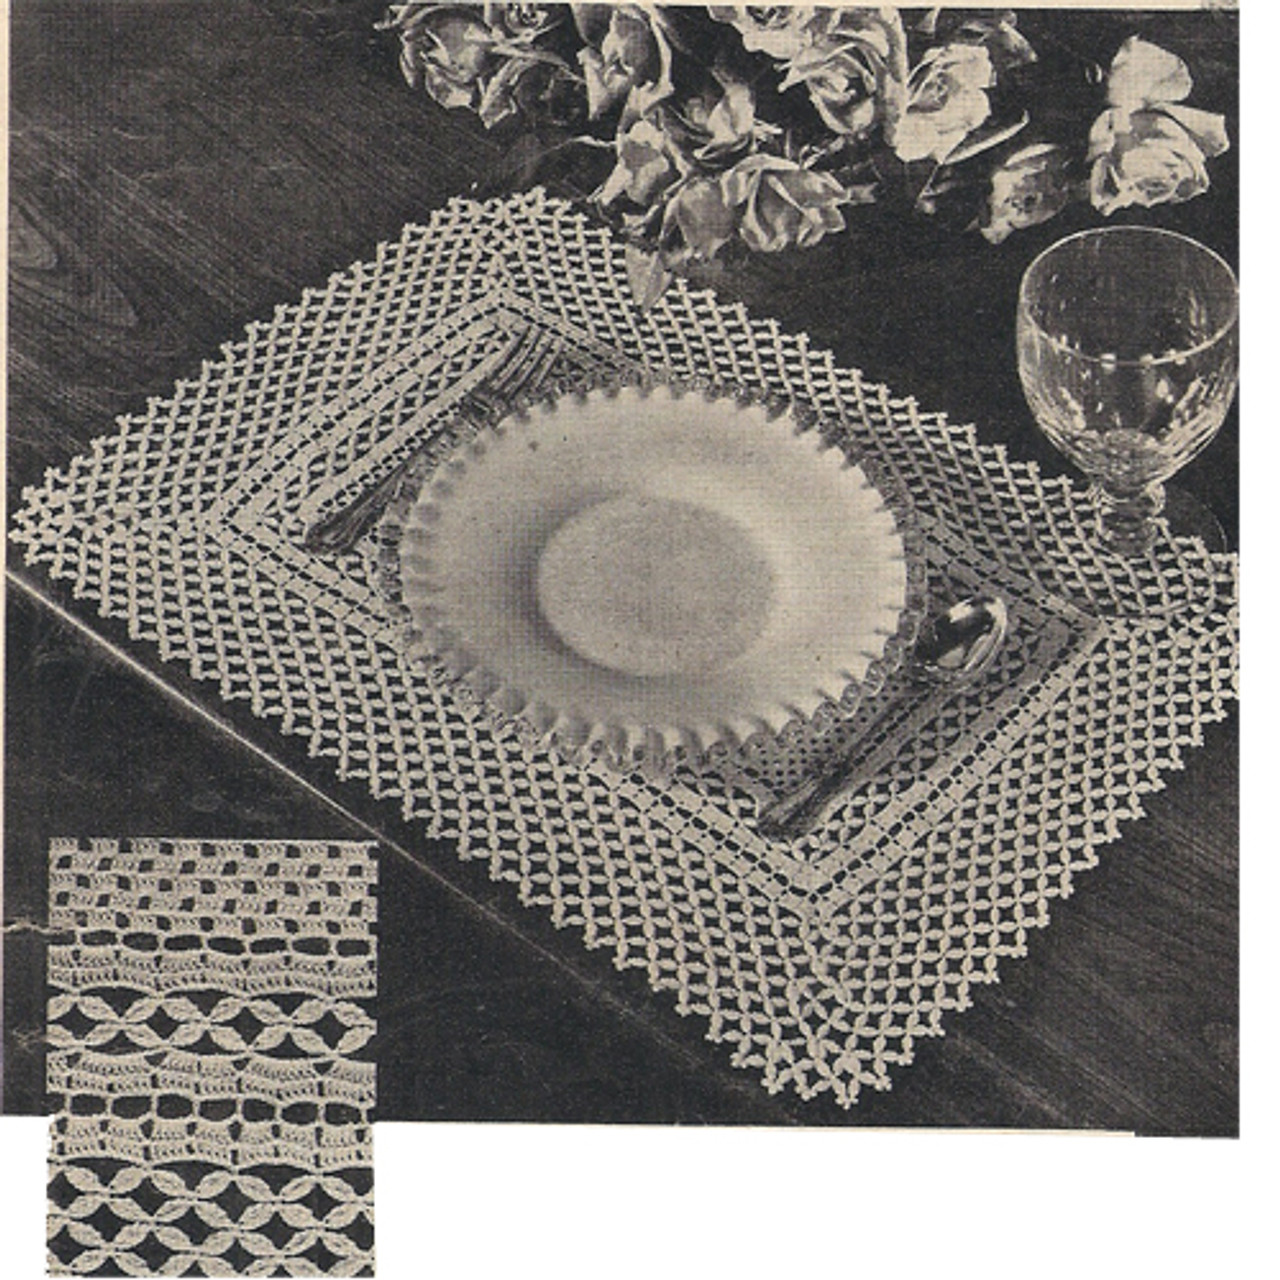 Crochet Honeycomb Lace Luncheon Set Pattern